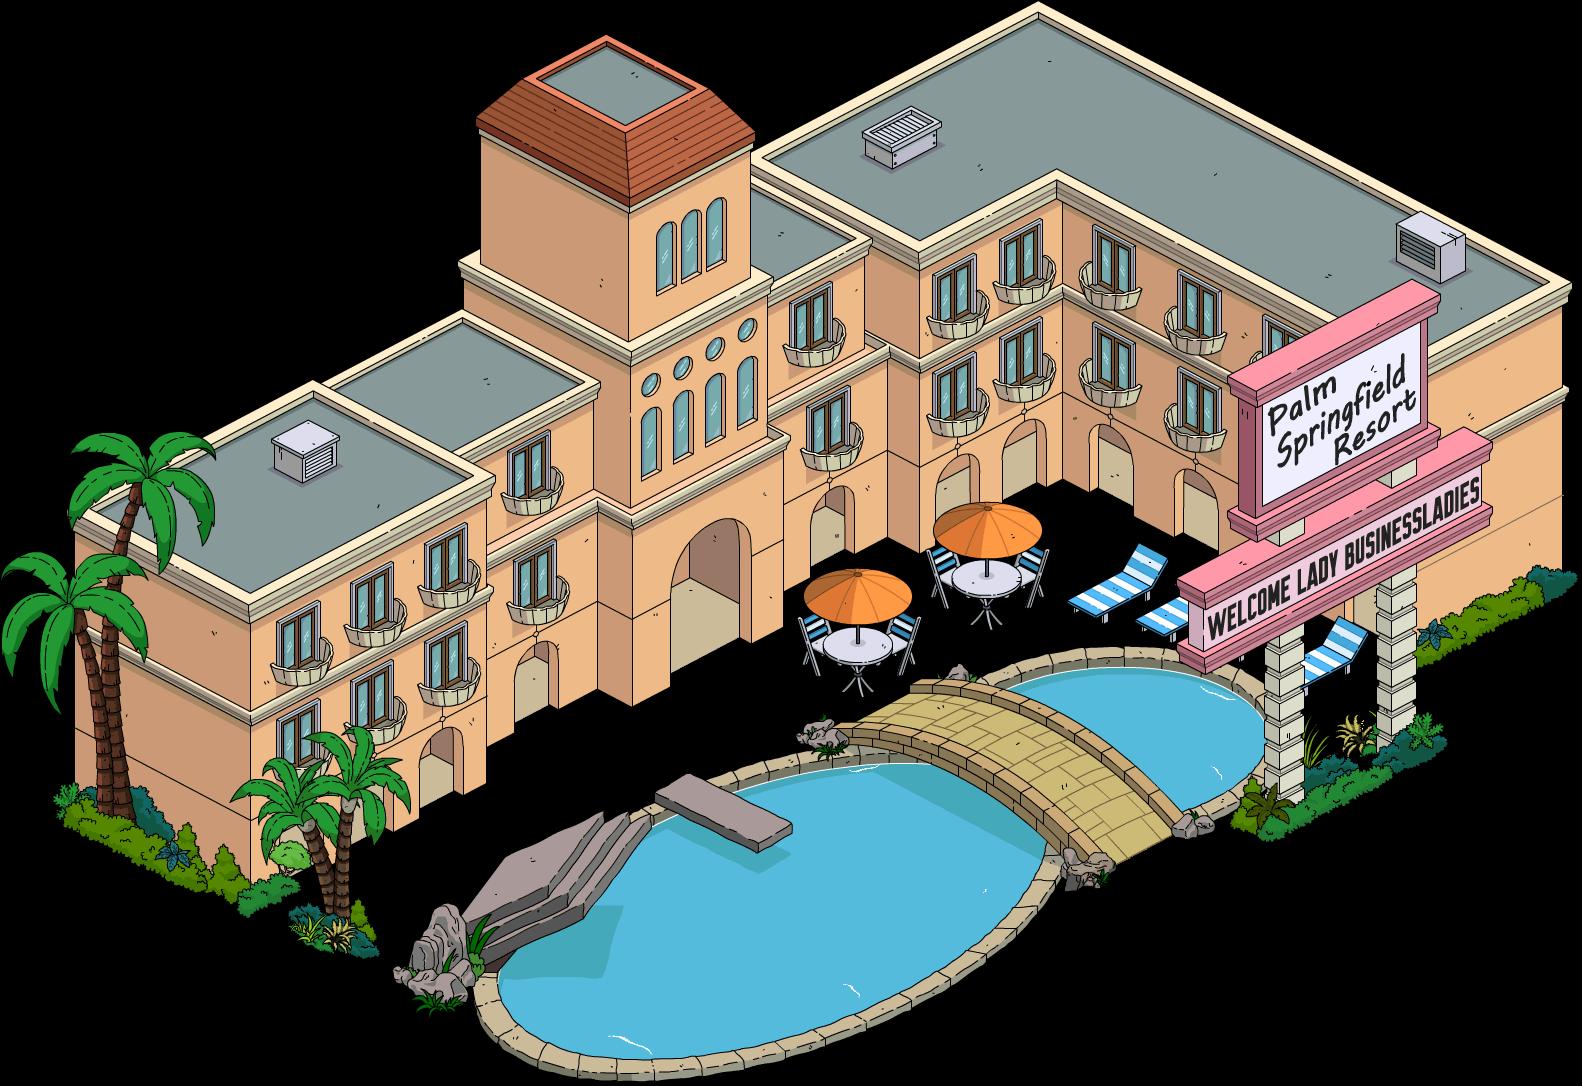 Hôtel Palm Springfield Resort